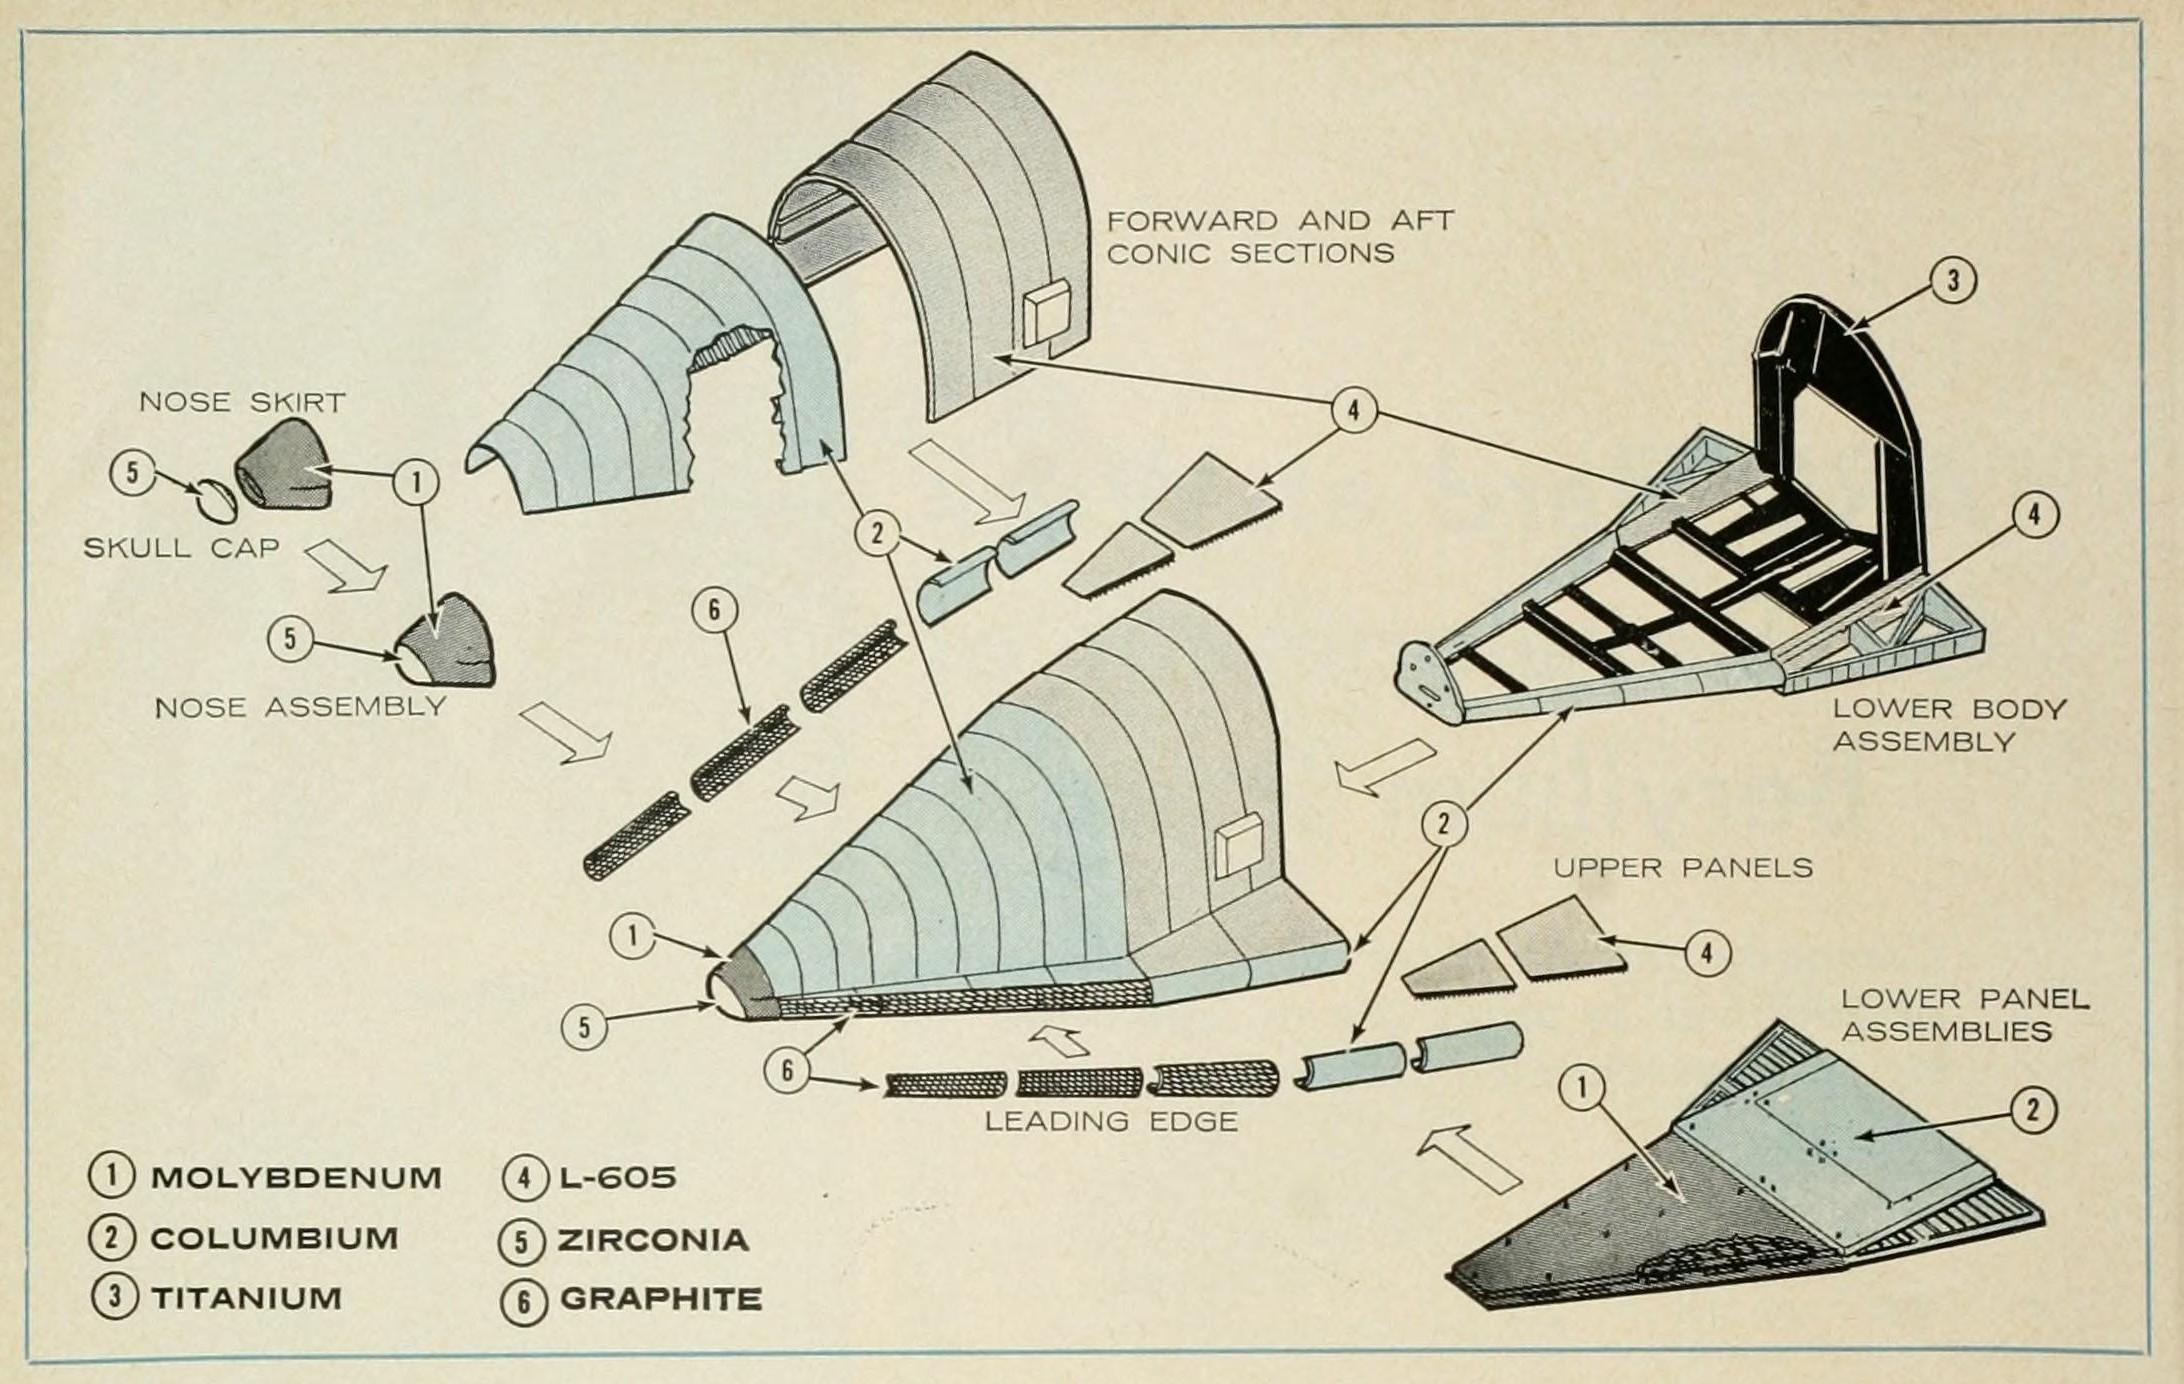 missilesrockets1213unse_0238.jpg